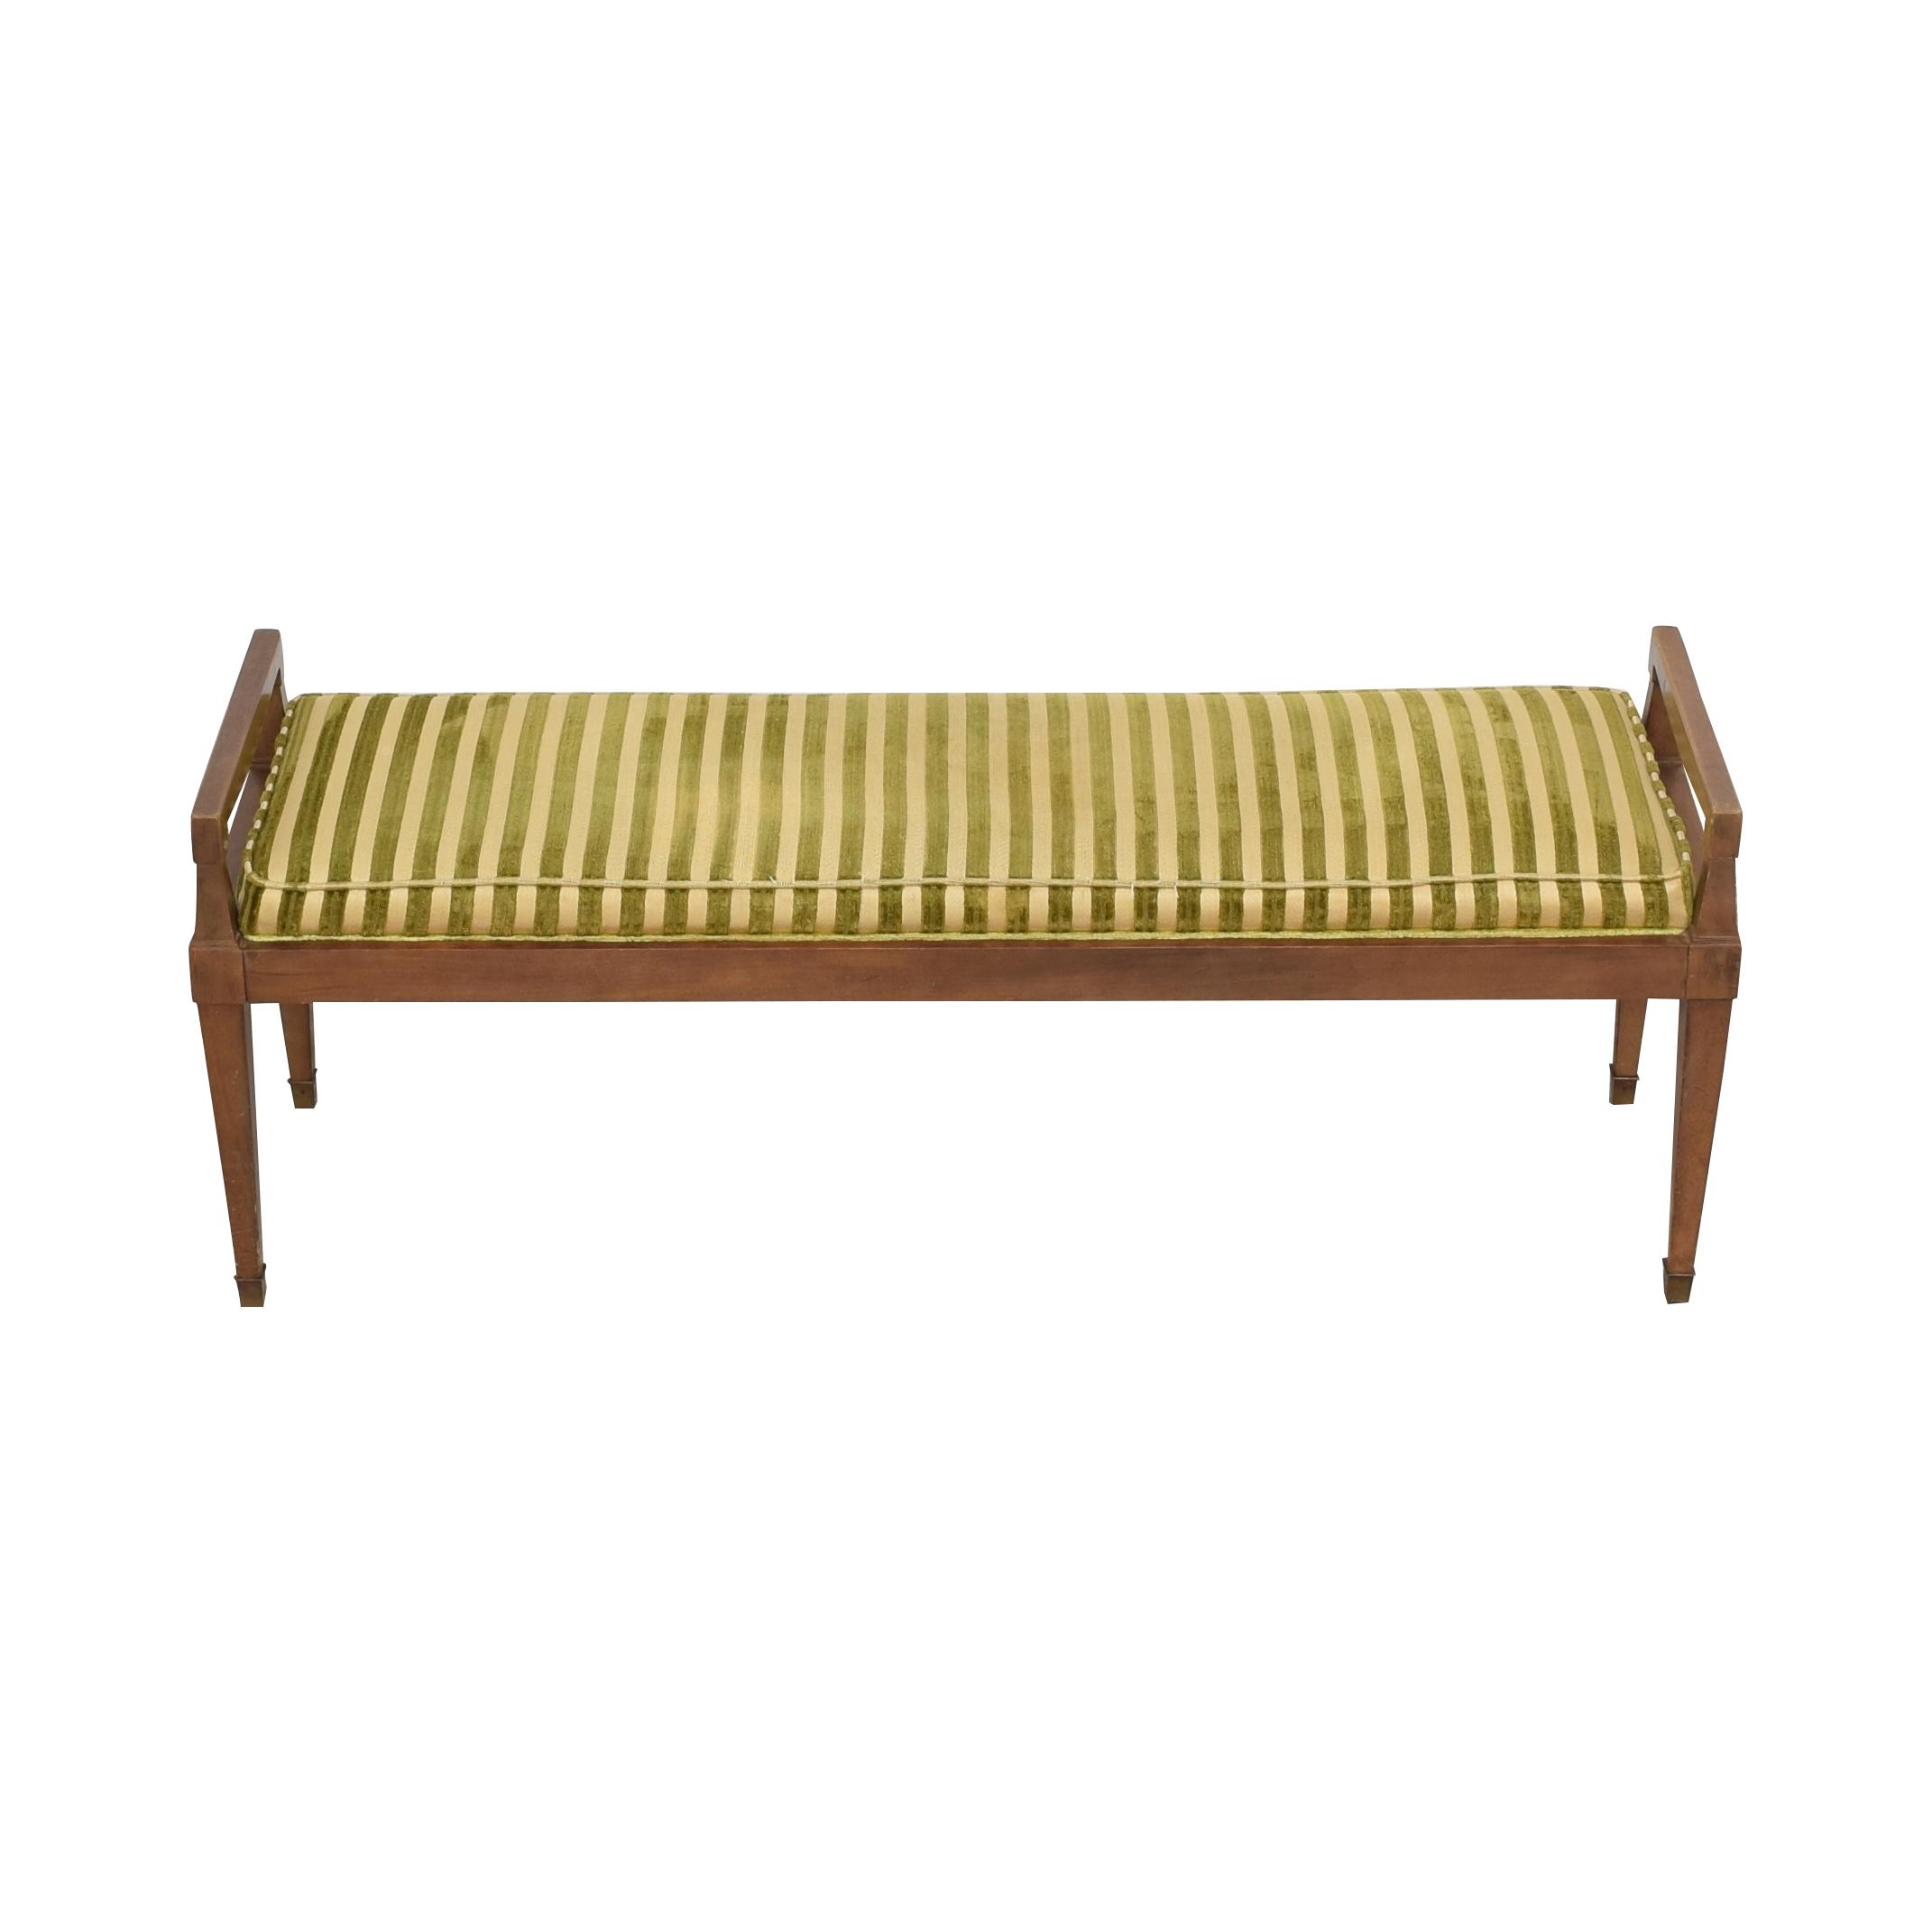 Drexel Vintage Drexel Cushioned Bench ct